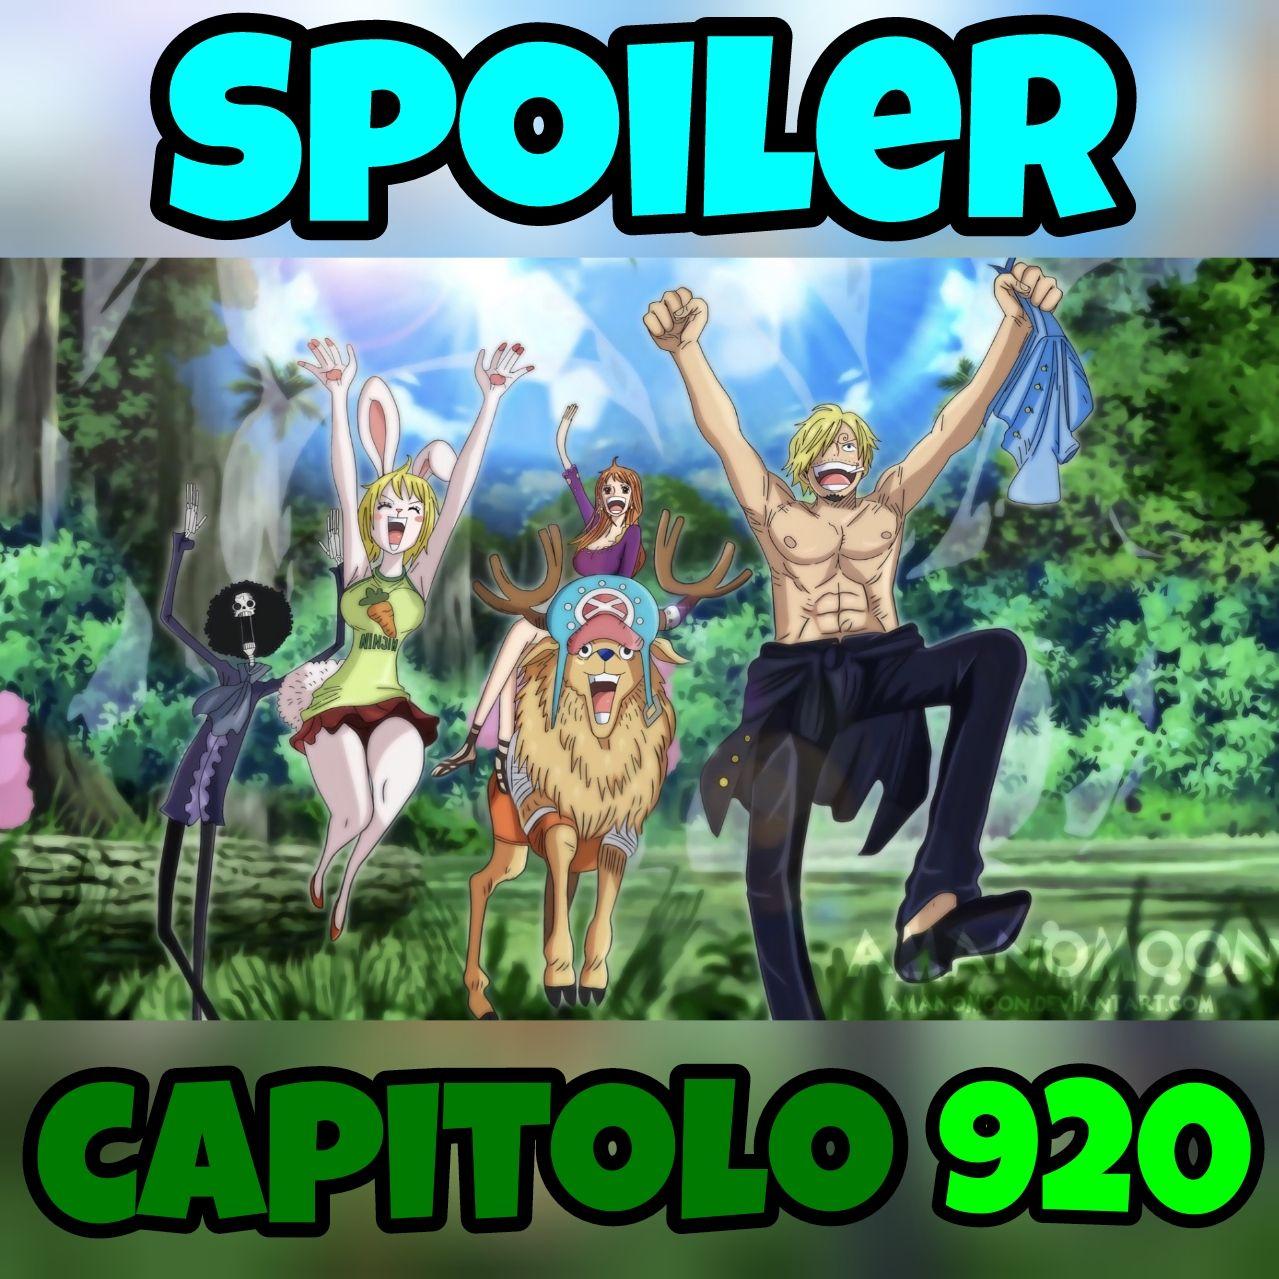 One Piece: Spoiler capitolo 920